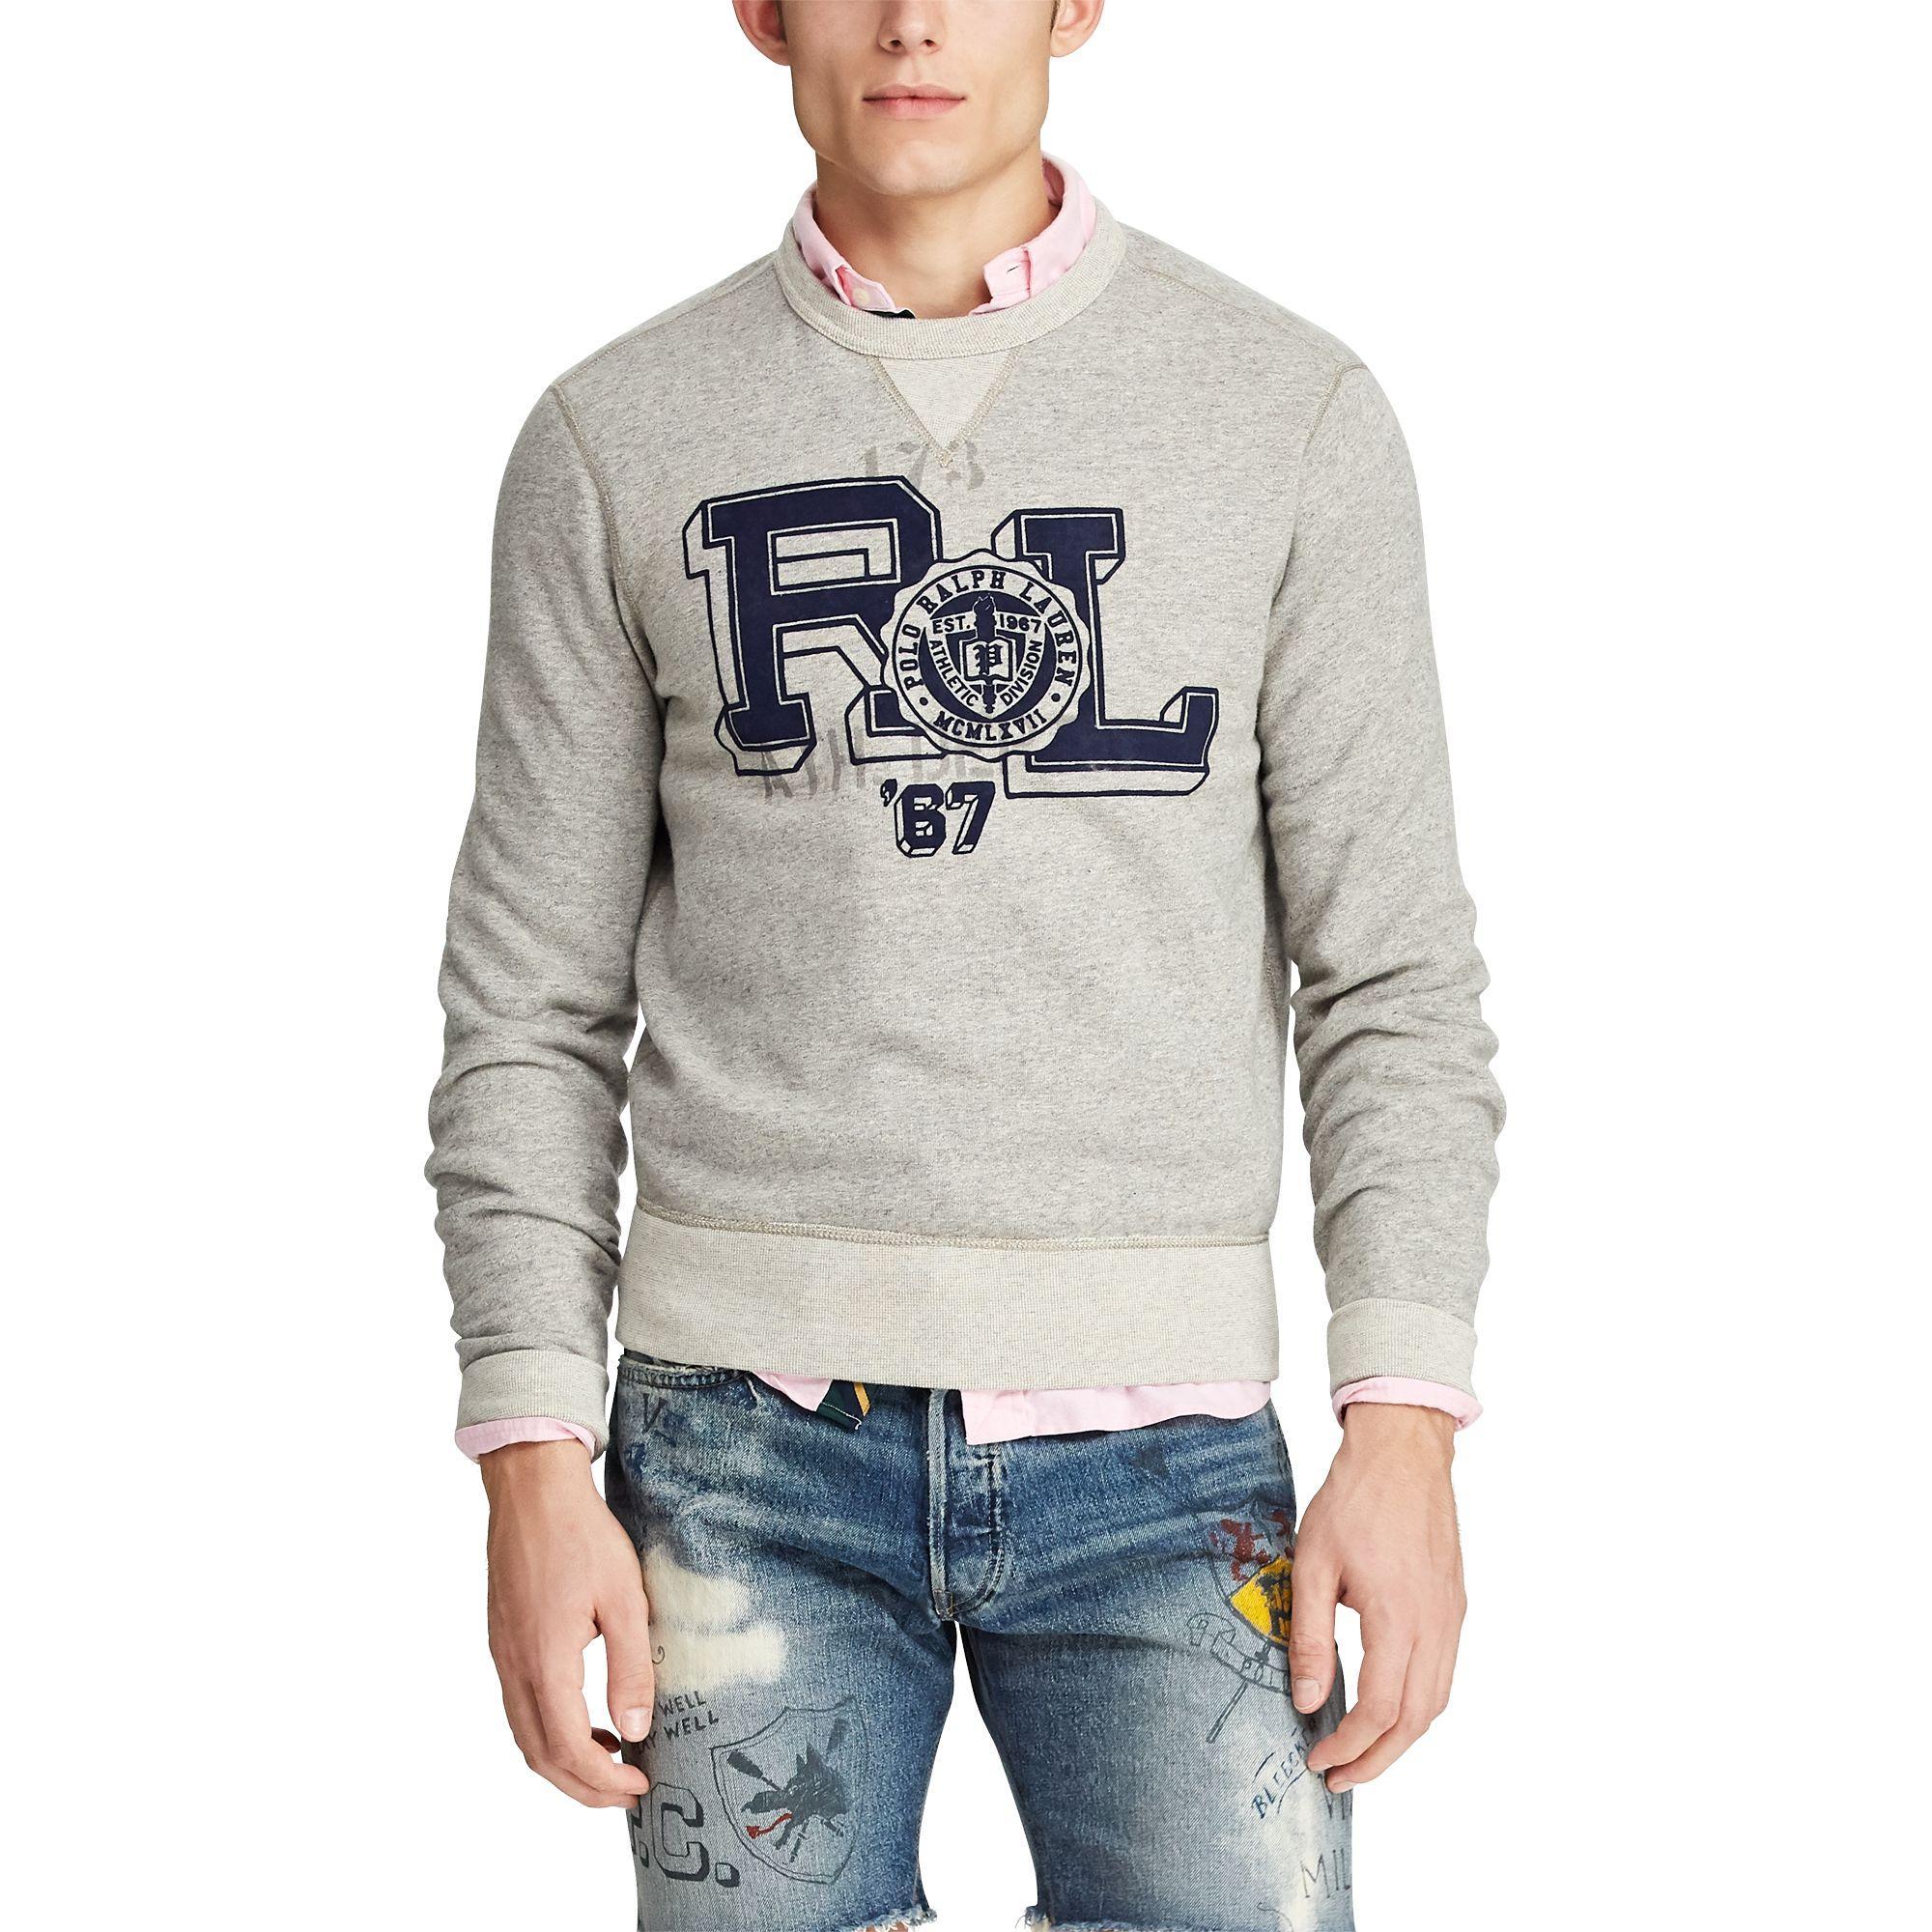 b0a9b696 Polo Ralph Lauren - Gray Fleece Graphic Sweatshirt for Men - Lyst. View  fullscreen